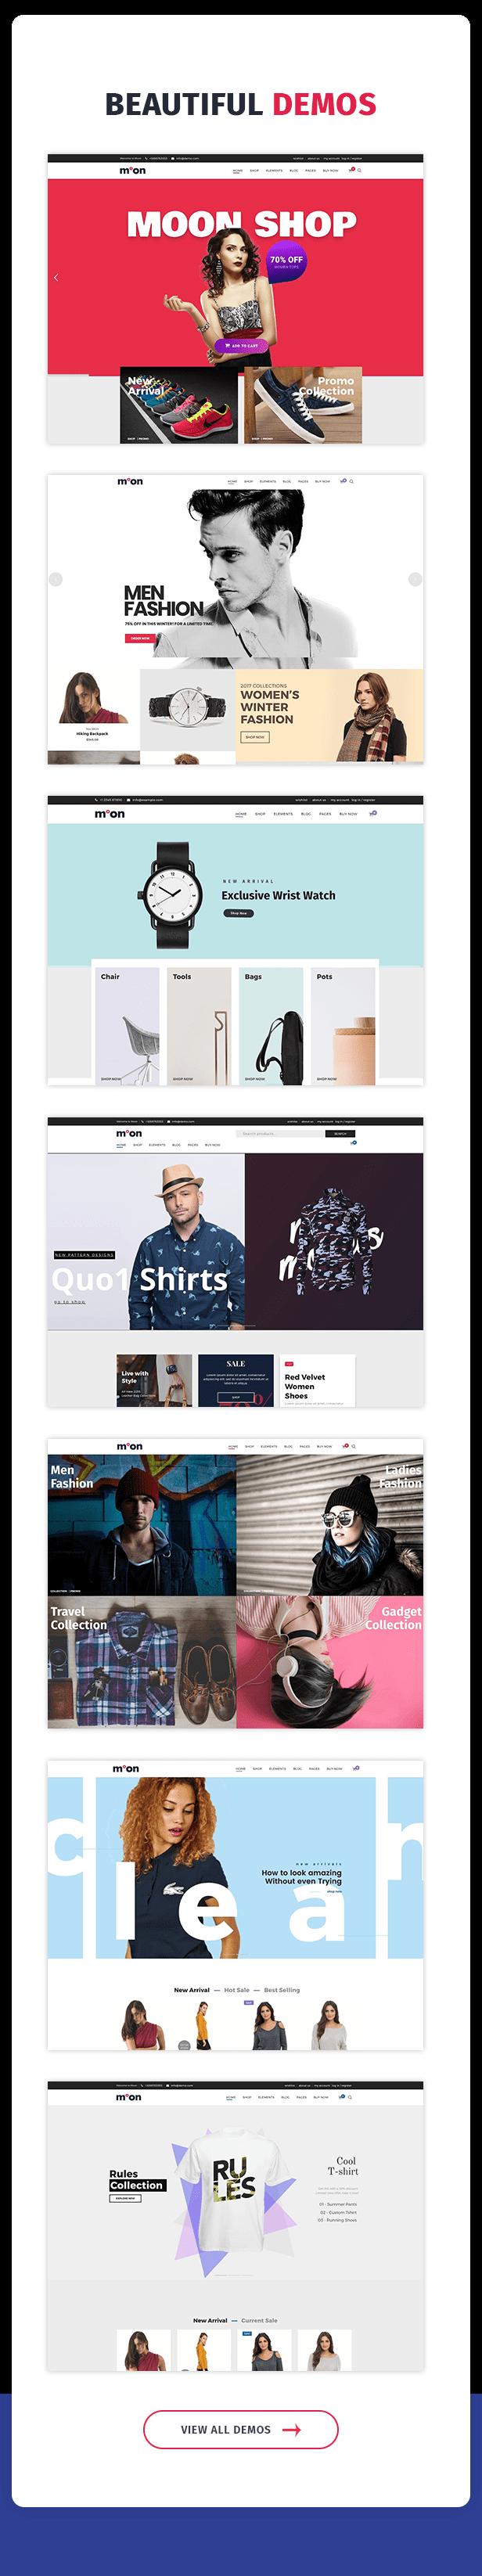 Moon Shop - Responsive eCommerce WordPress Theme for WooCommerce - 9